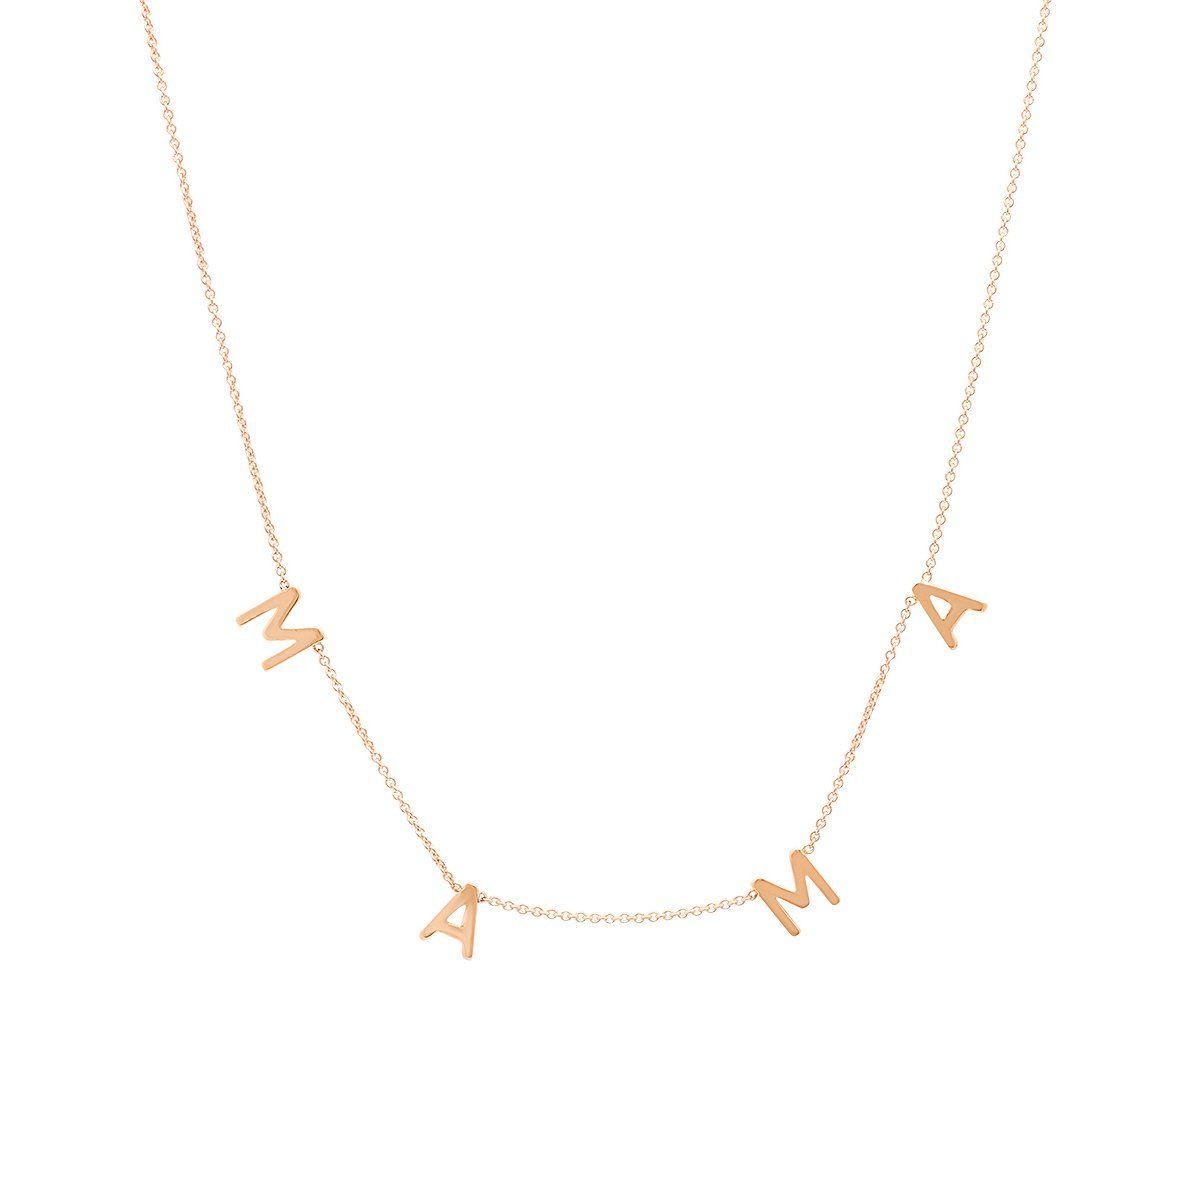 Mama Necklace In 2021 Mama Necklace Necklace Jewelry Inspiration